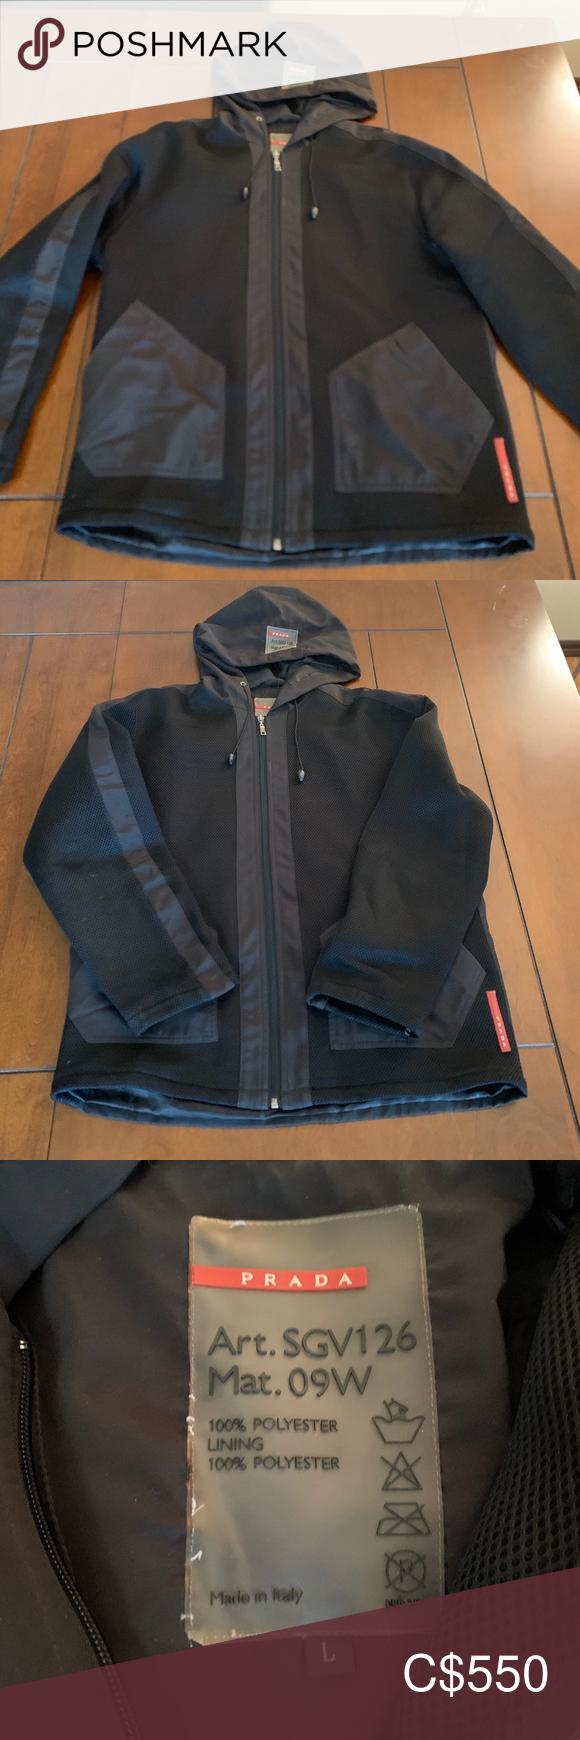 Prada Men S Svg126 Black Jacket L Prada Men Black Jacket Jackets [ 1740 x 580 Pixel ]